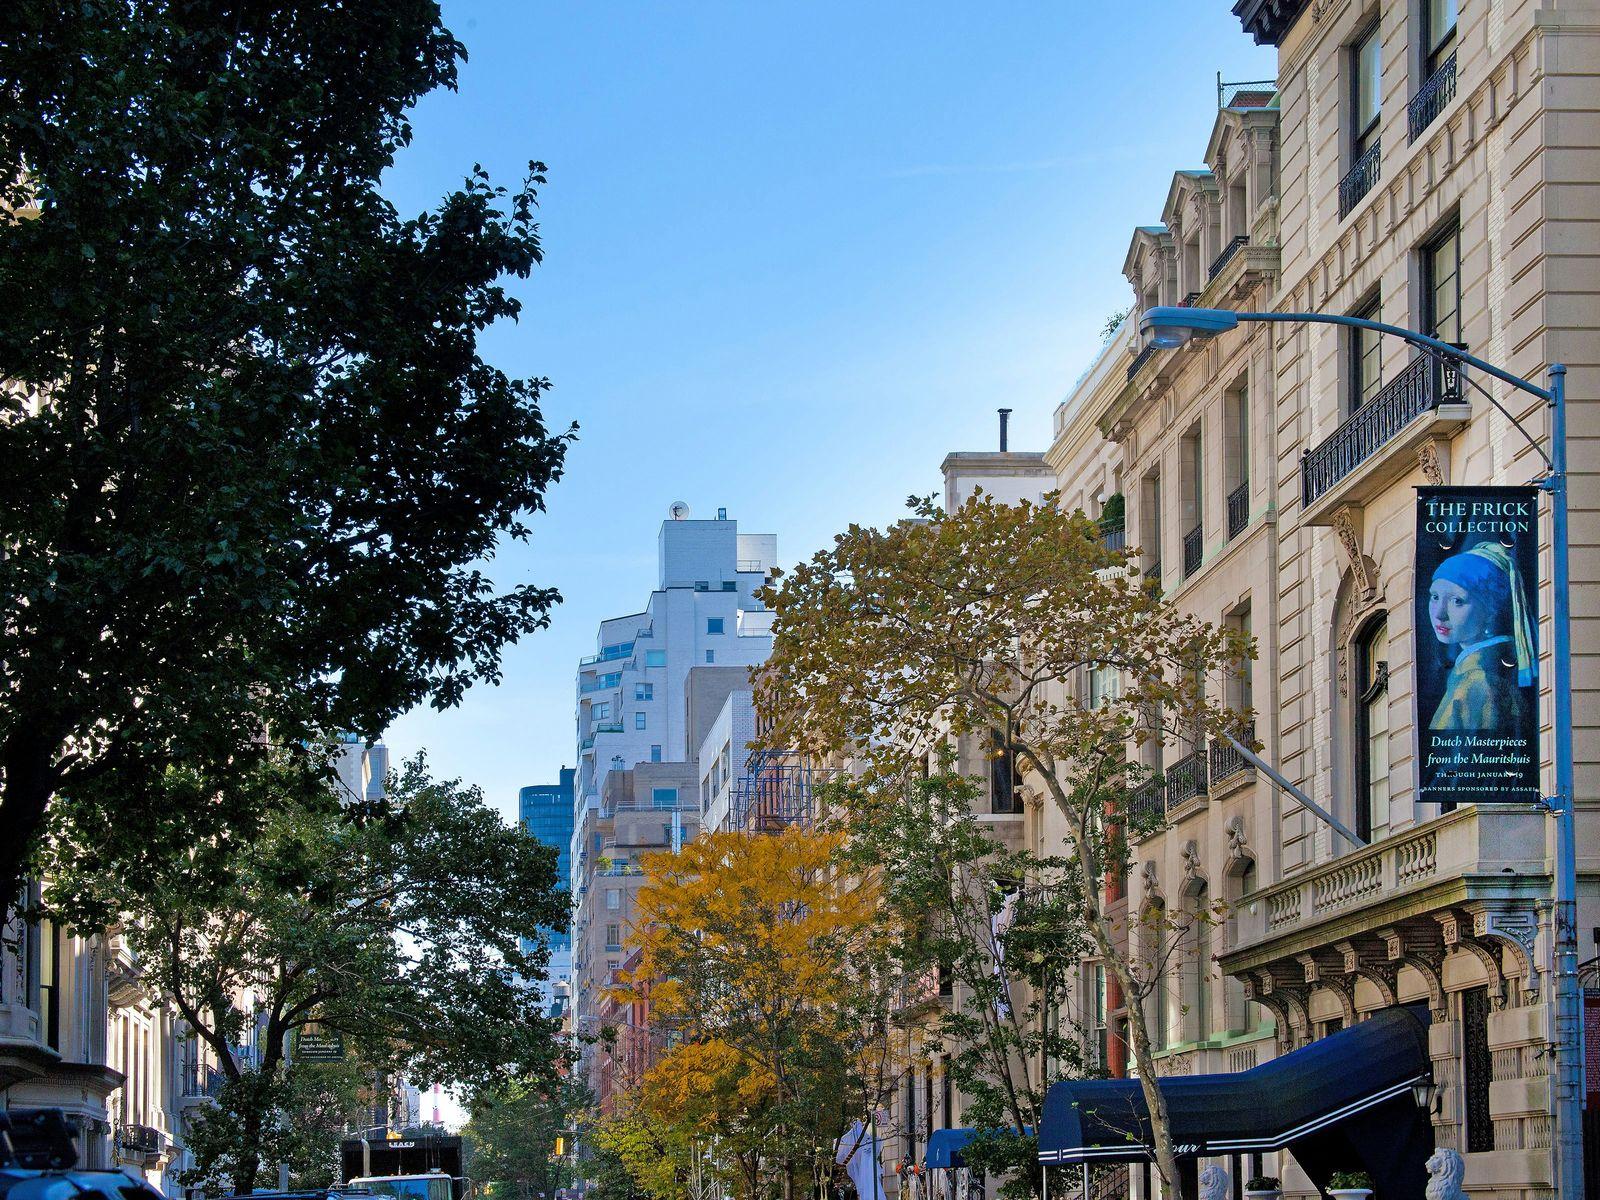 857 Fifth Avenue